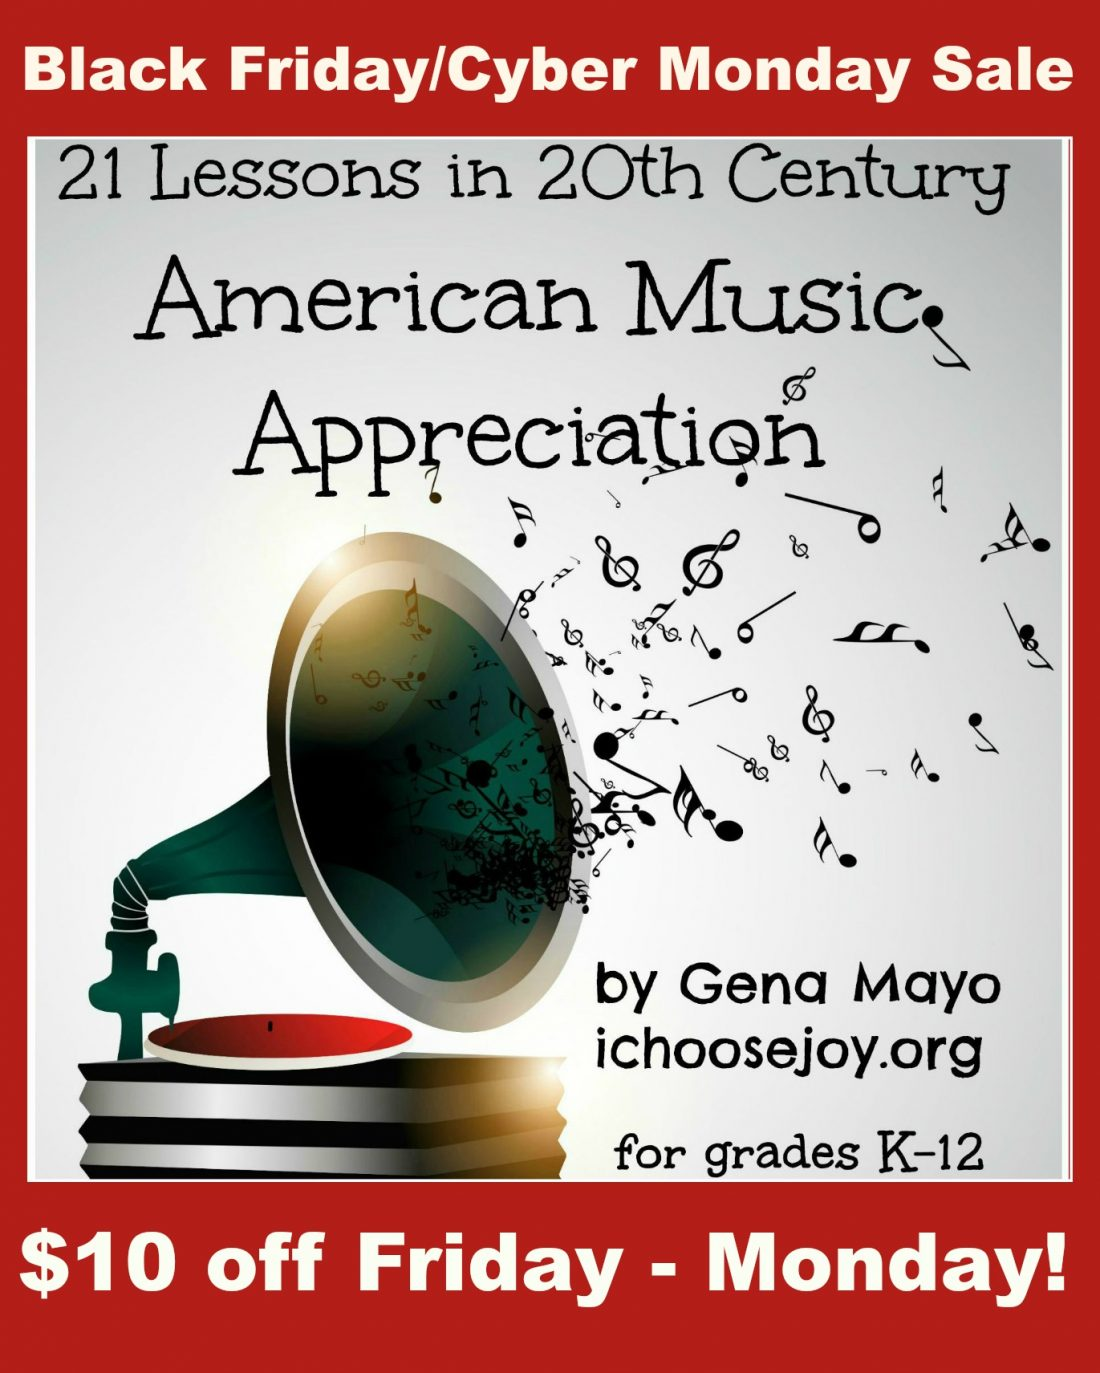 Get $10 off 20th Century American Music Curriculum!